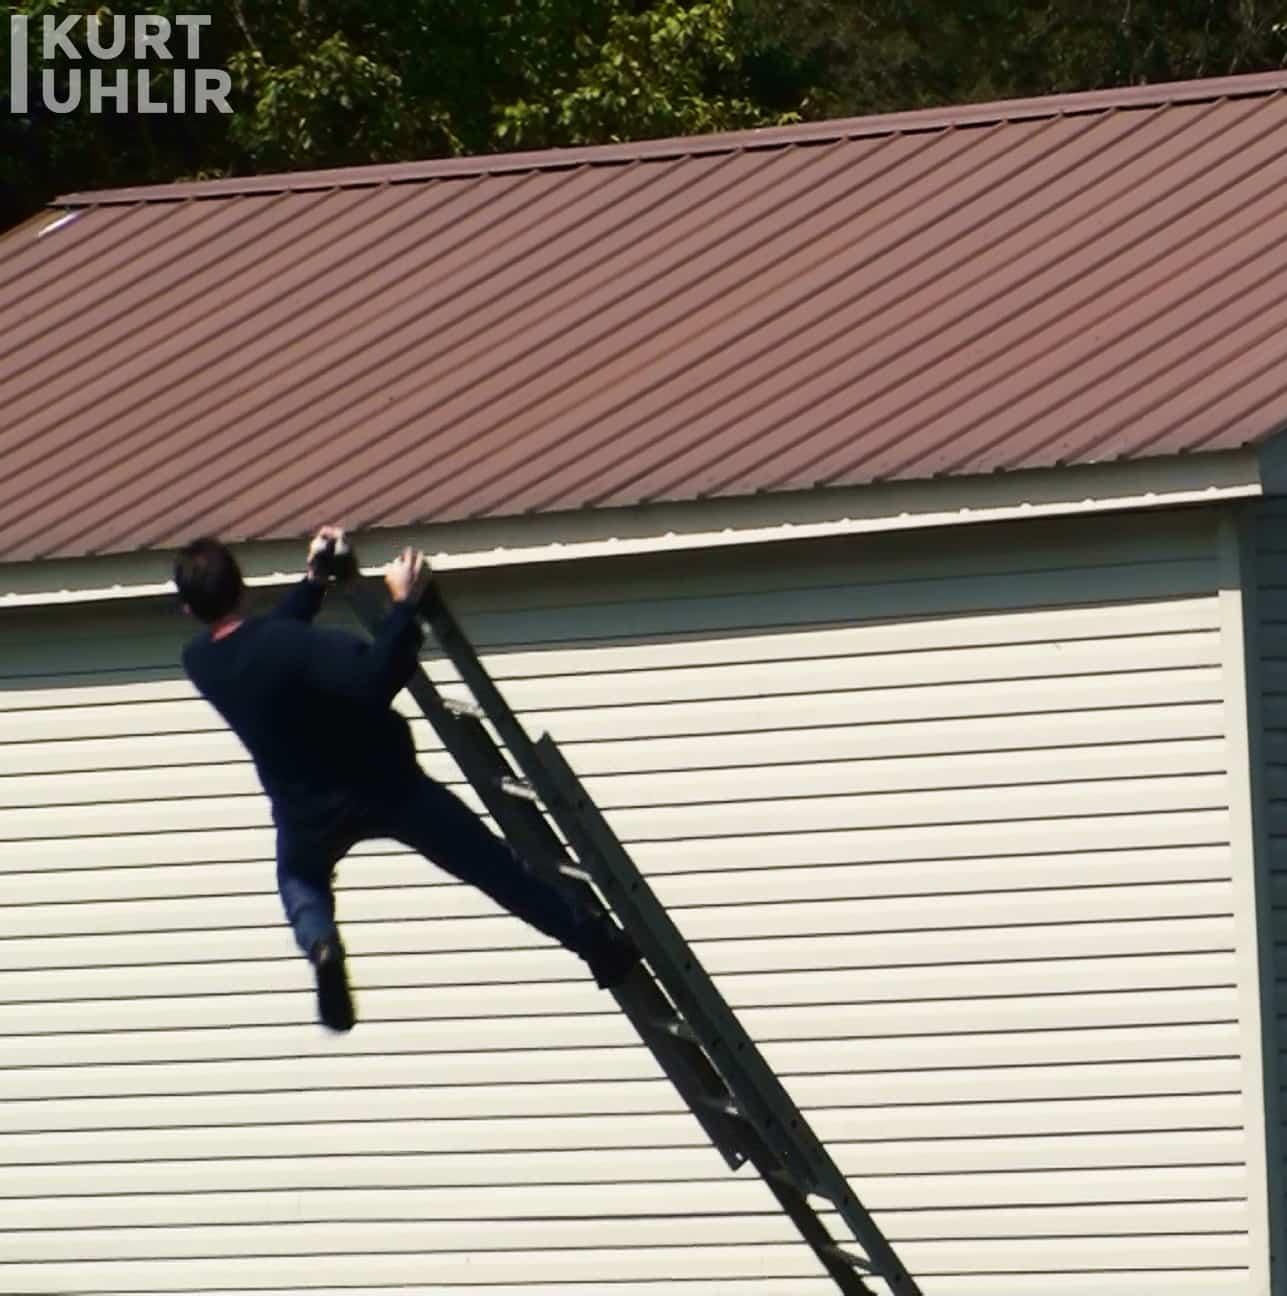 Stuntman Kurt Uhlir falling off a ladder